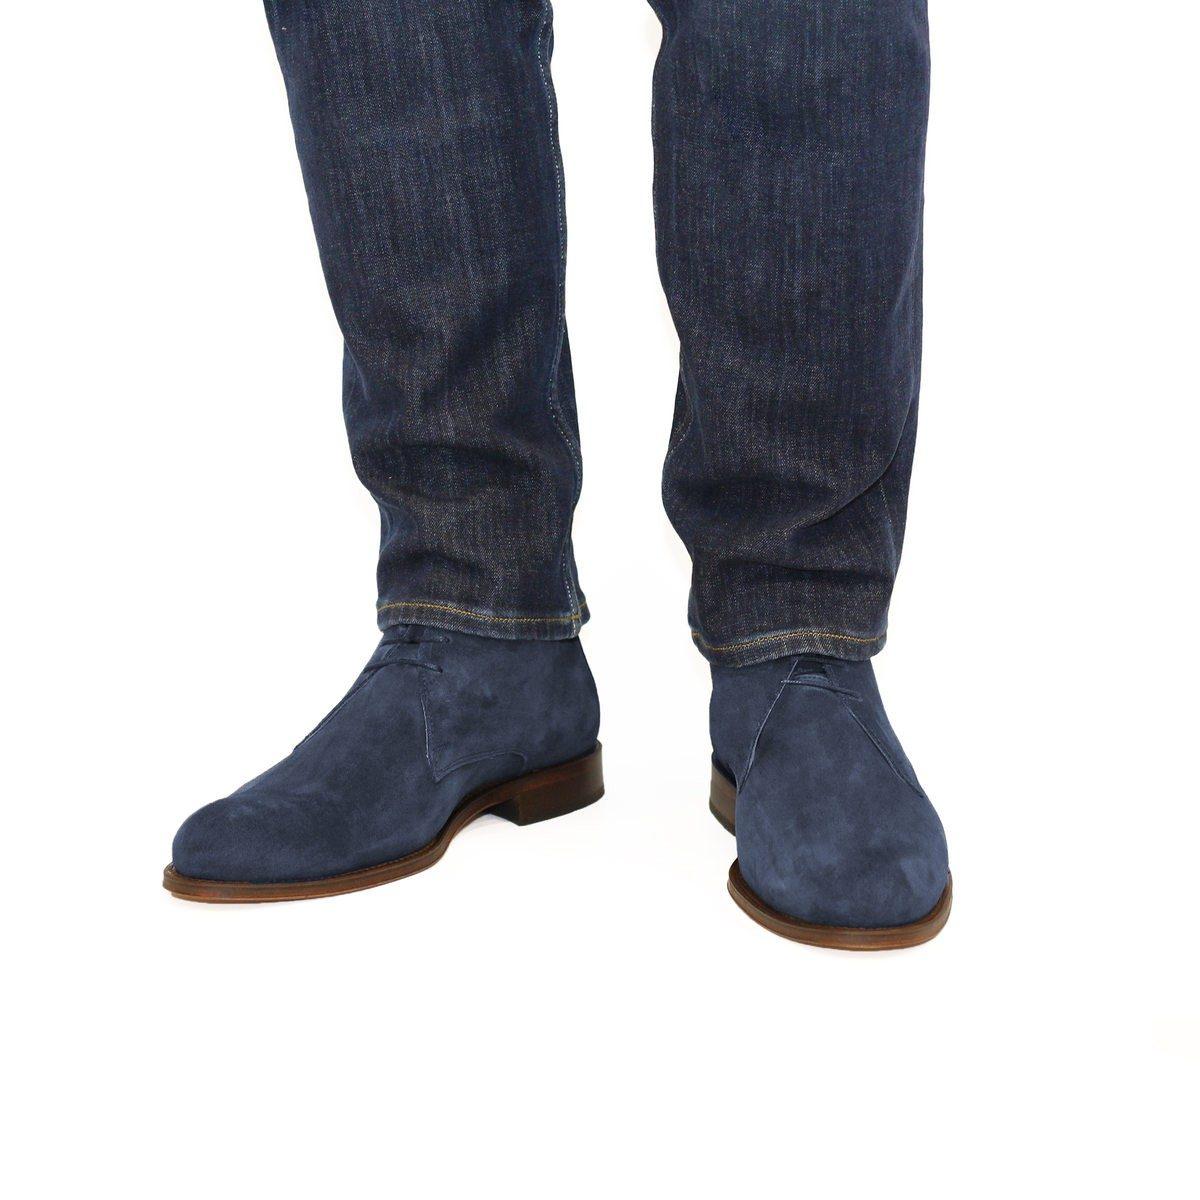 homme automne 2017 Jules et Jenn - desert boots cuir daim bleu